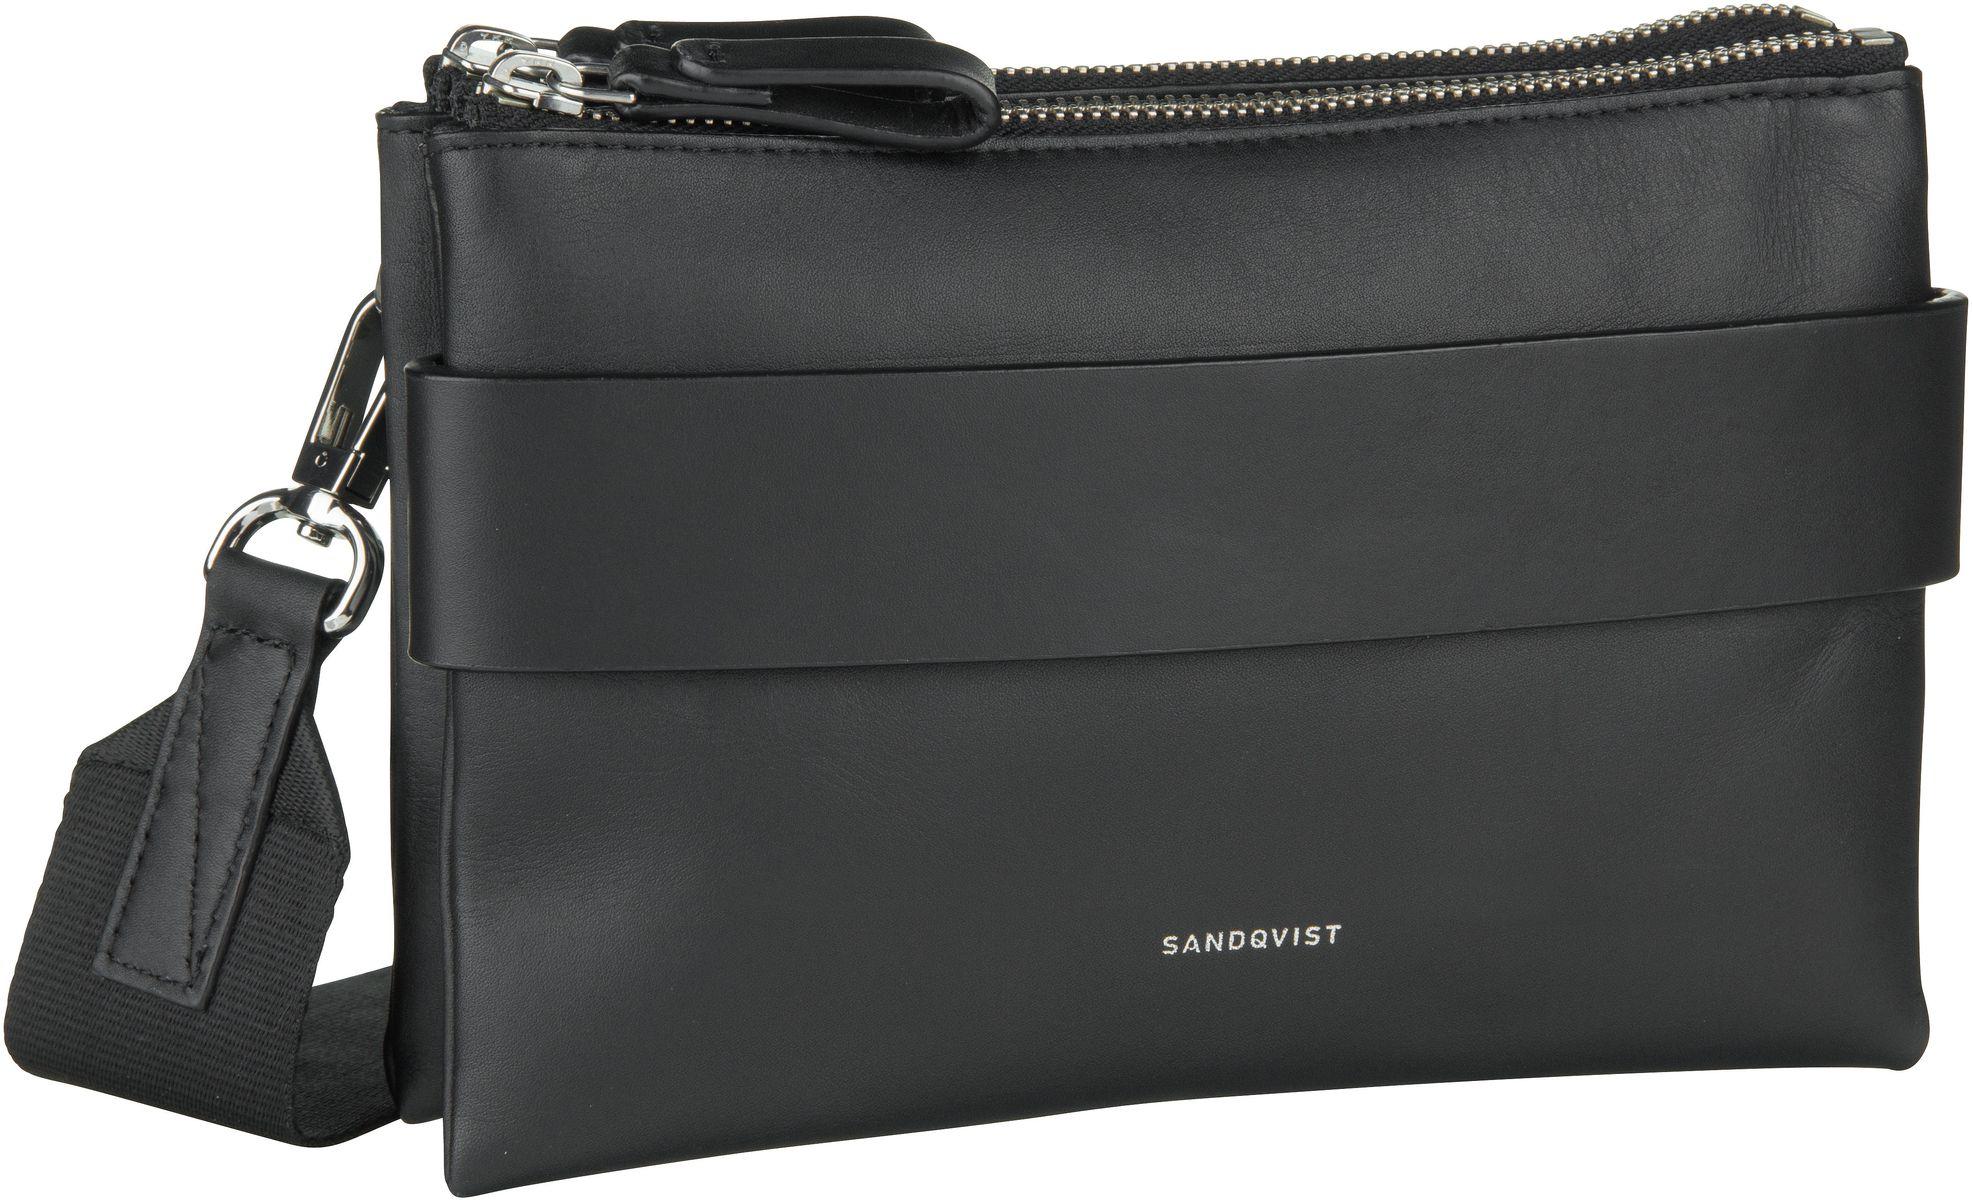 Handtasche Victoria Small Shoulder Bag Black (0.6 Liter)